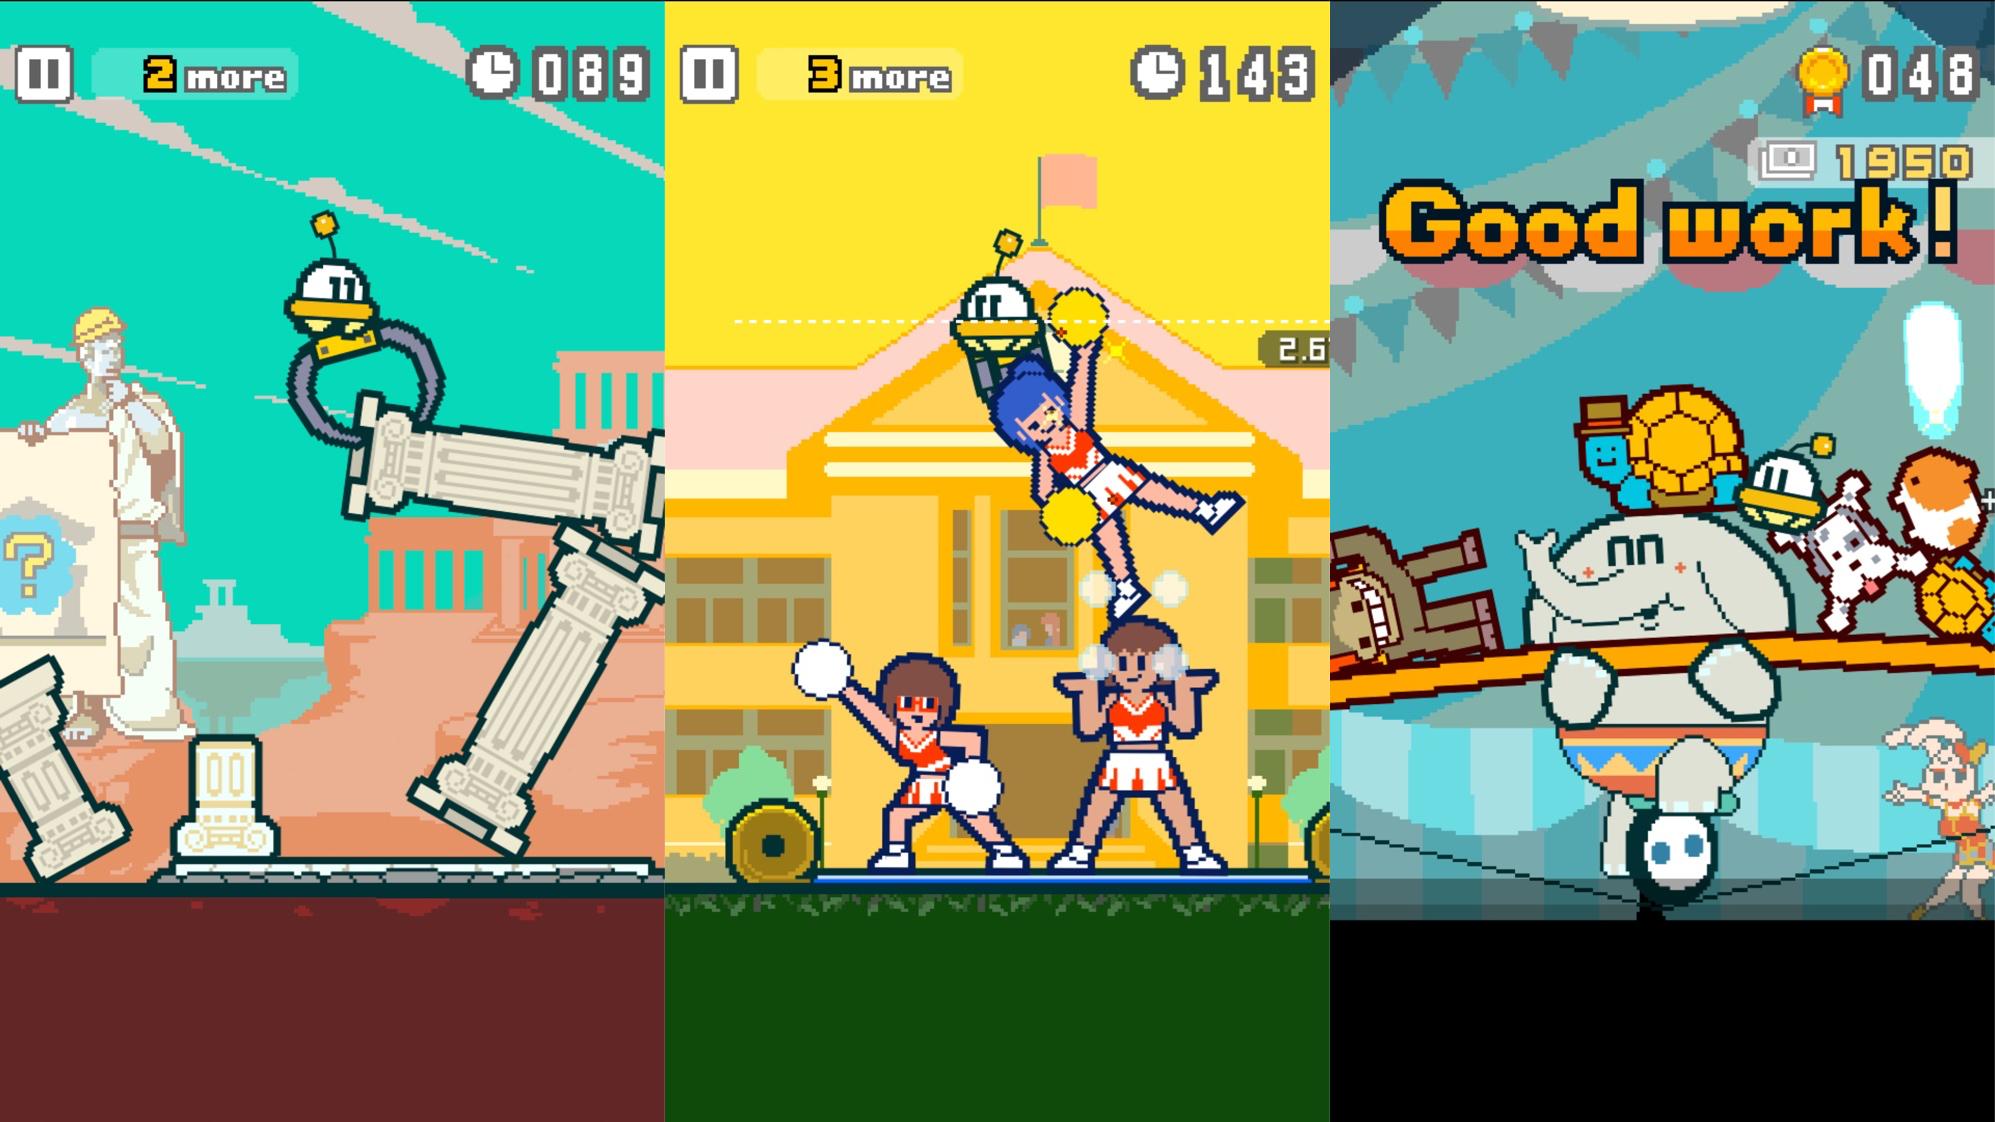 xtZp9djk4k9fLej4Hhi3rS - The best Android games